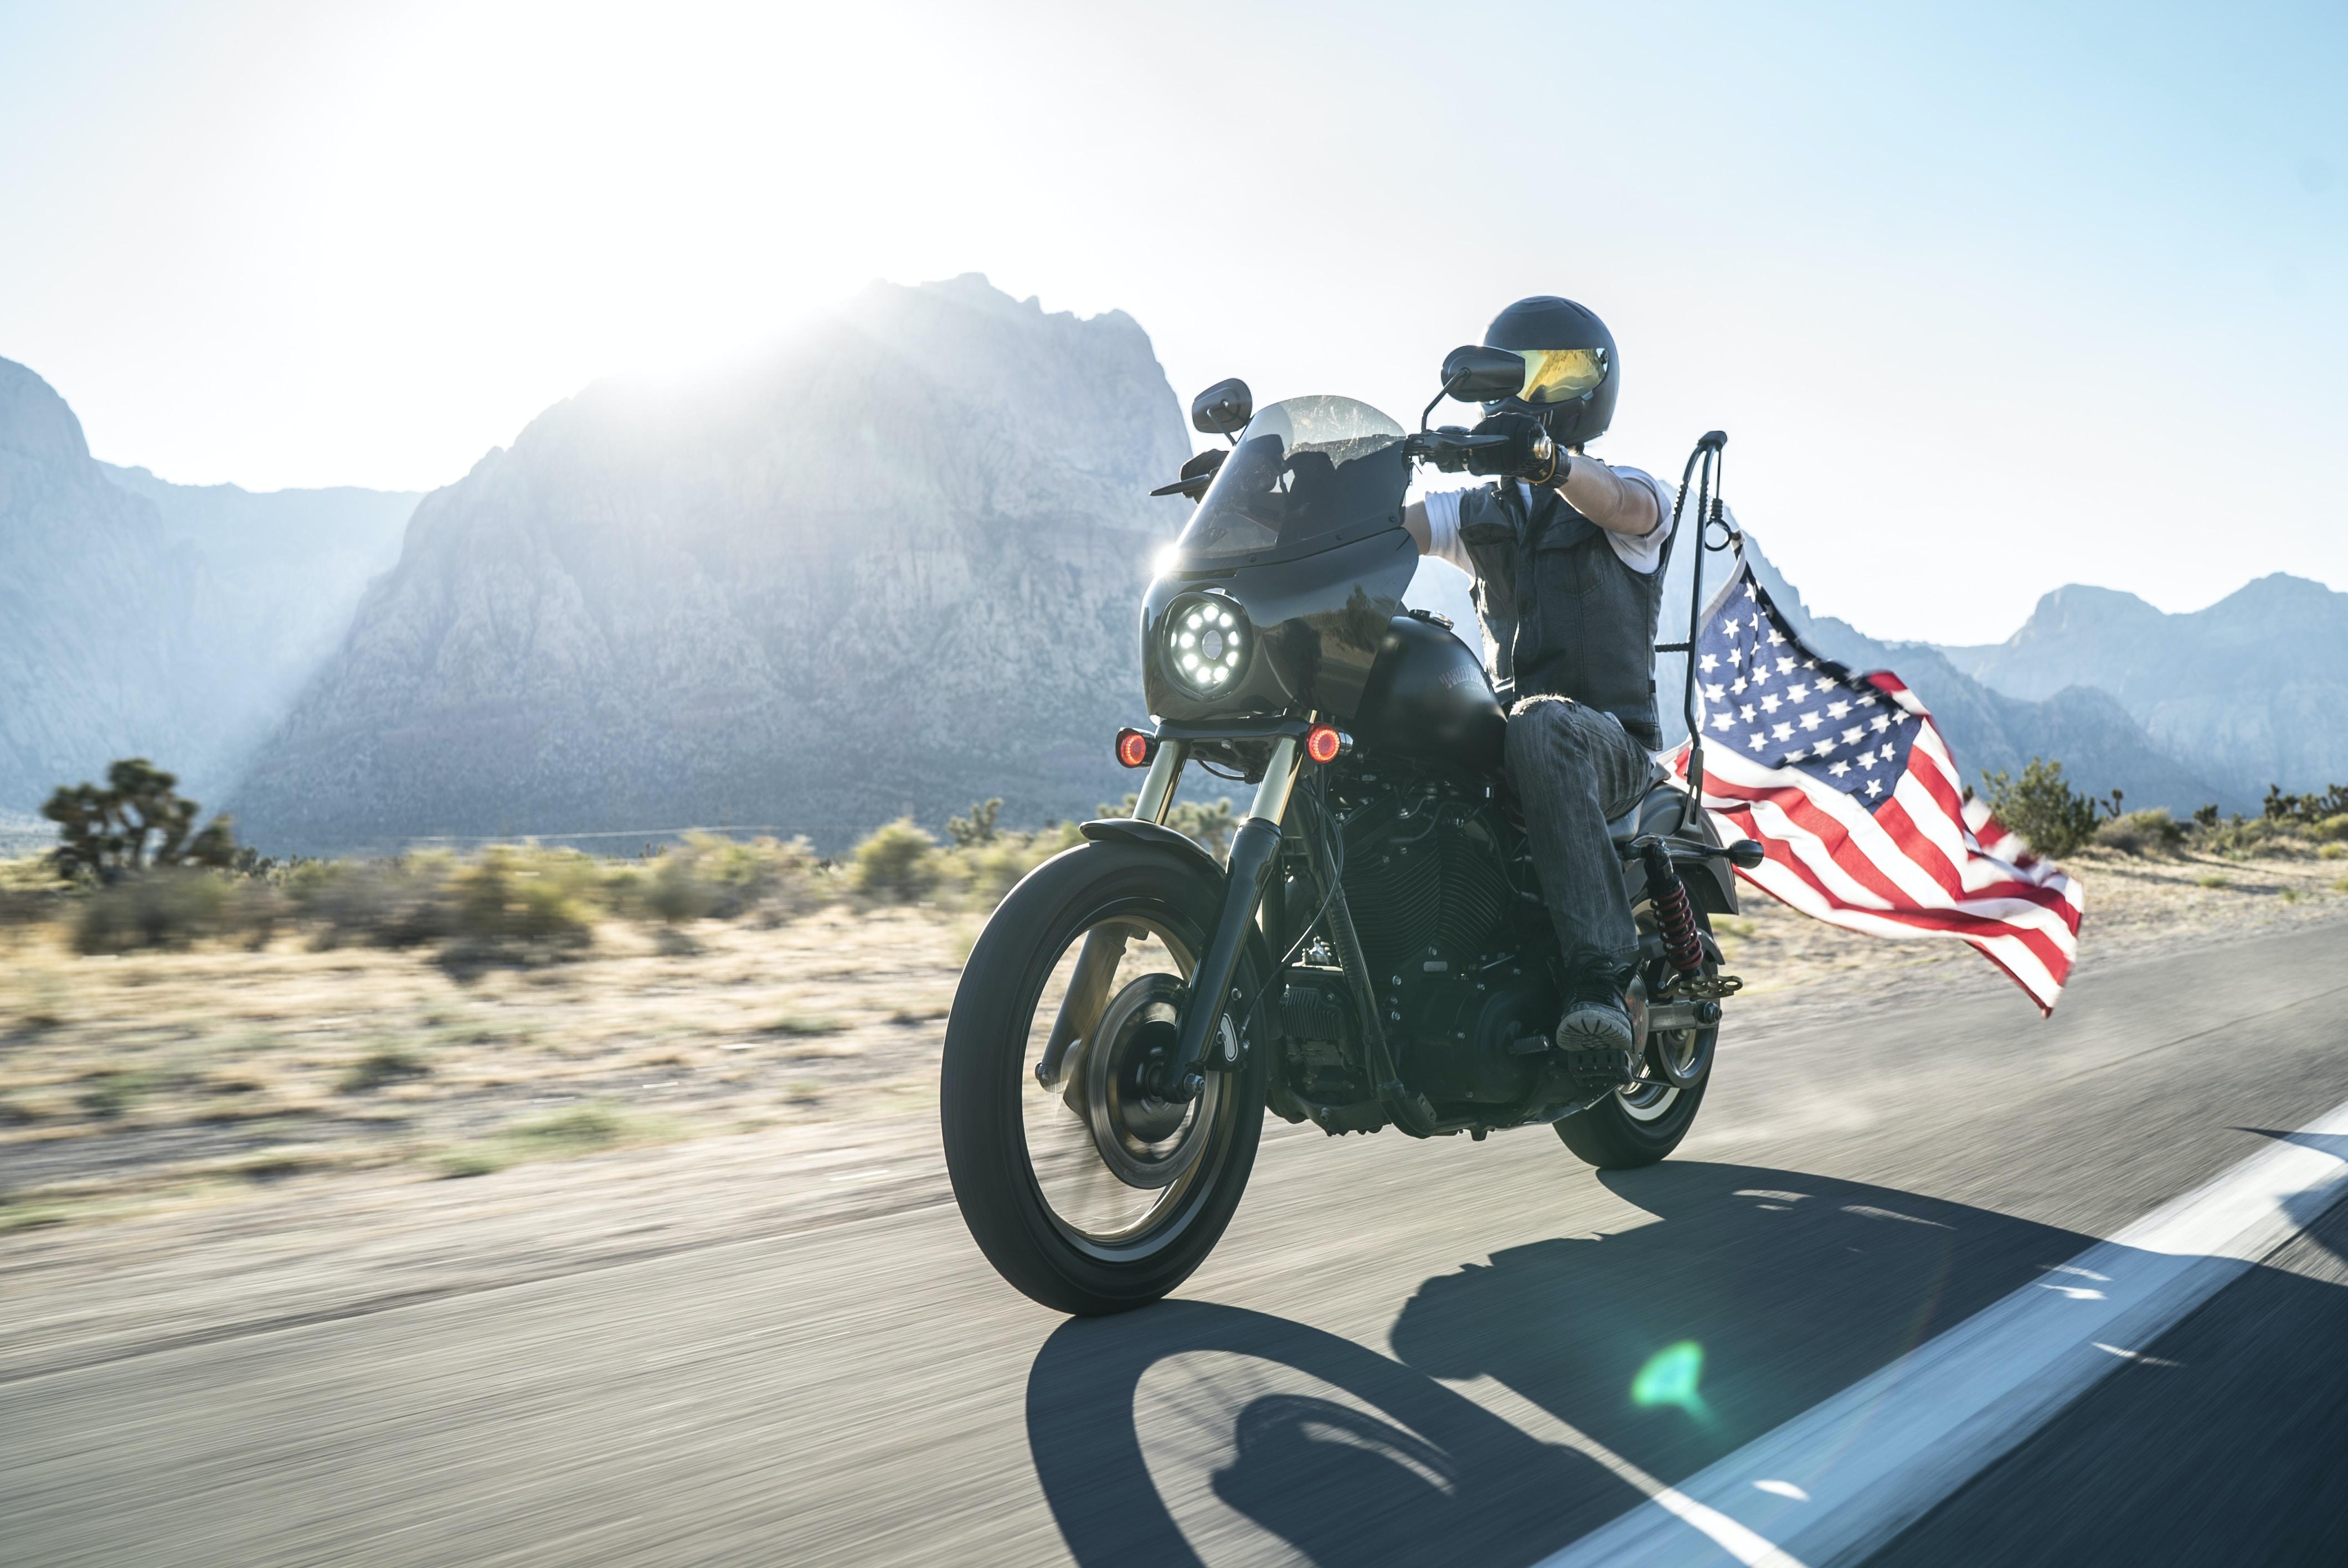 fanning photography of man riding cruiser motorcycle near mountain